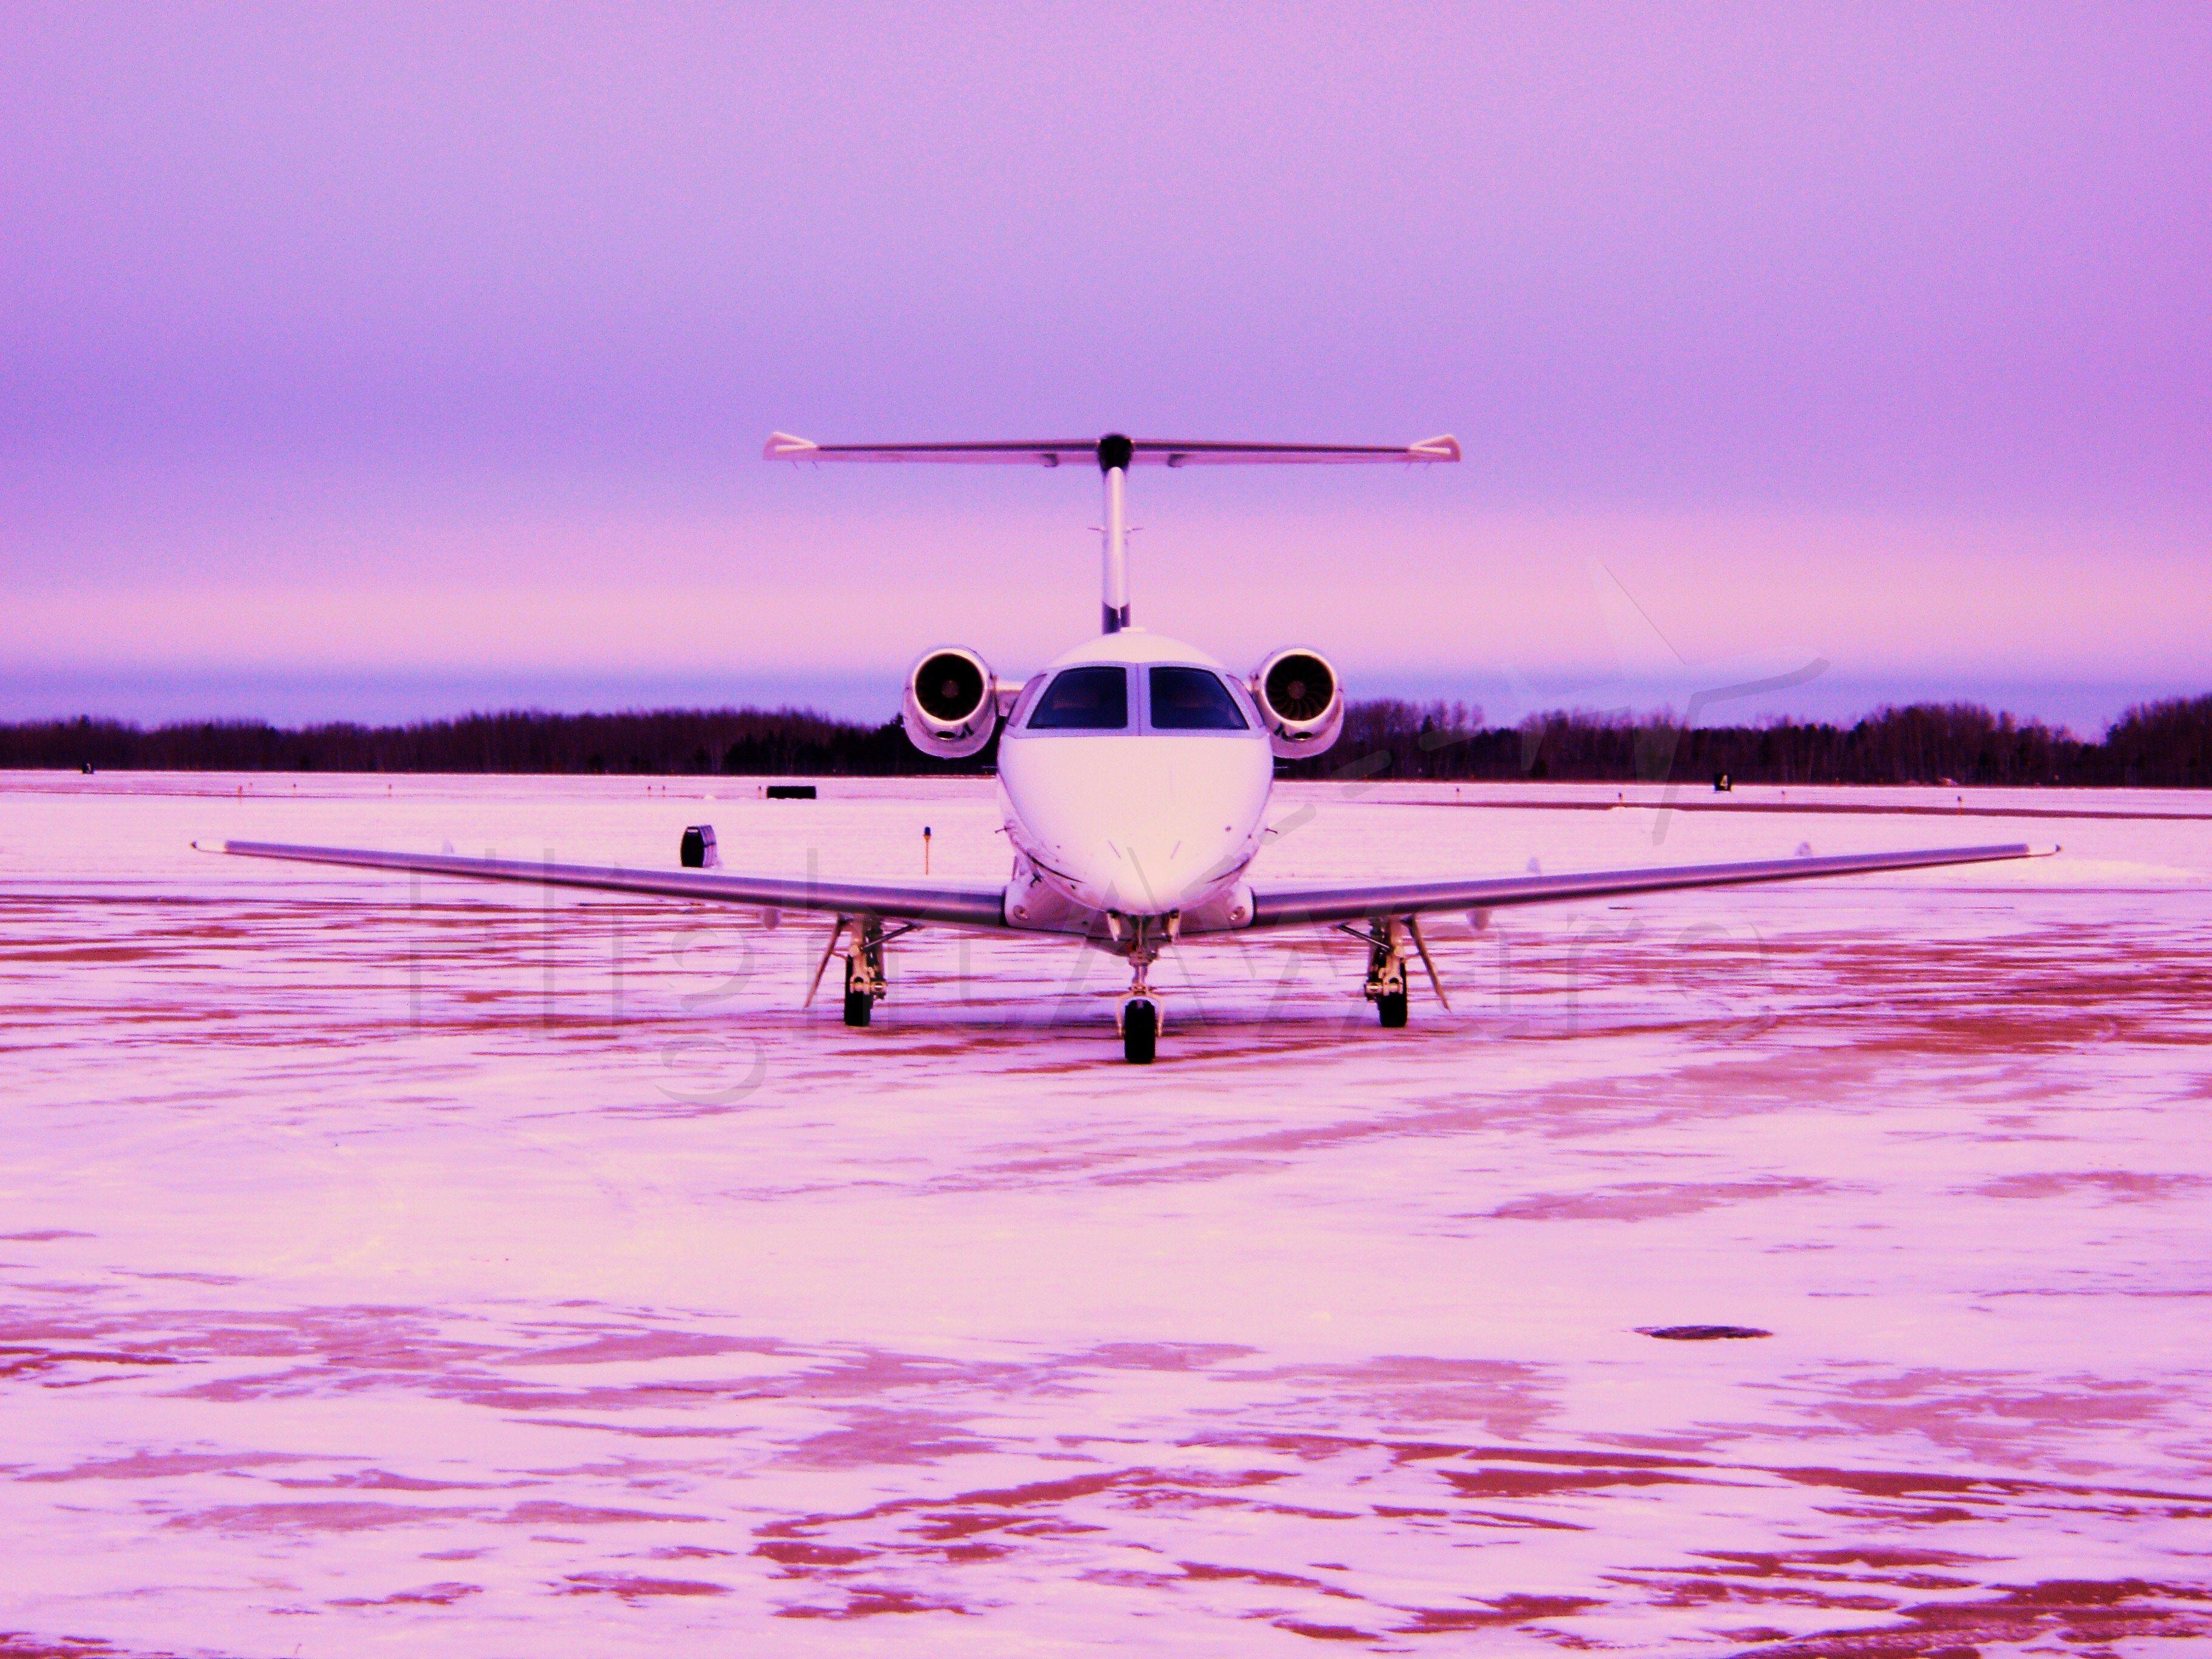 Embraer Phenom 100 (N876JC) - Taken in Bemidji,MN in late December. -22 degrees C.